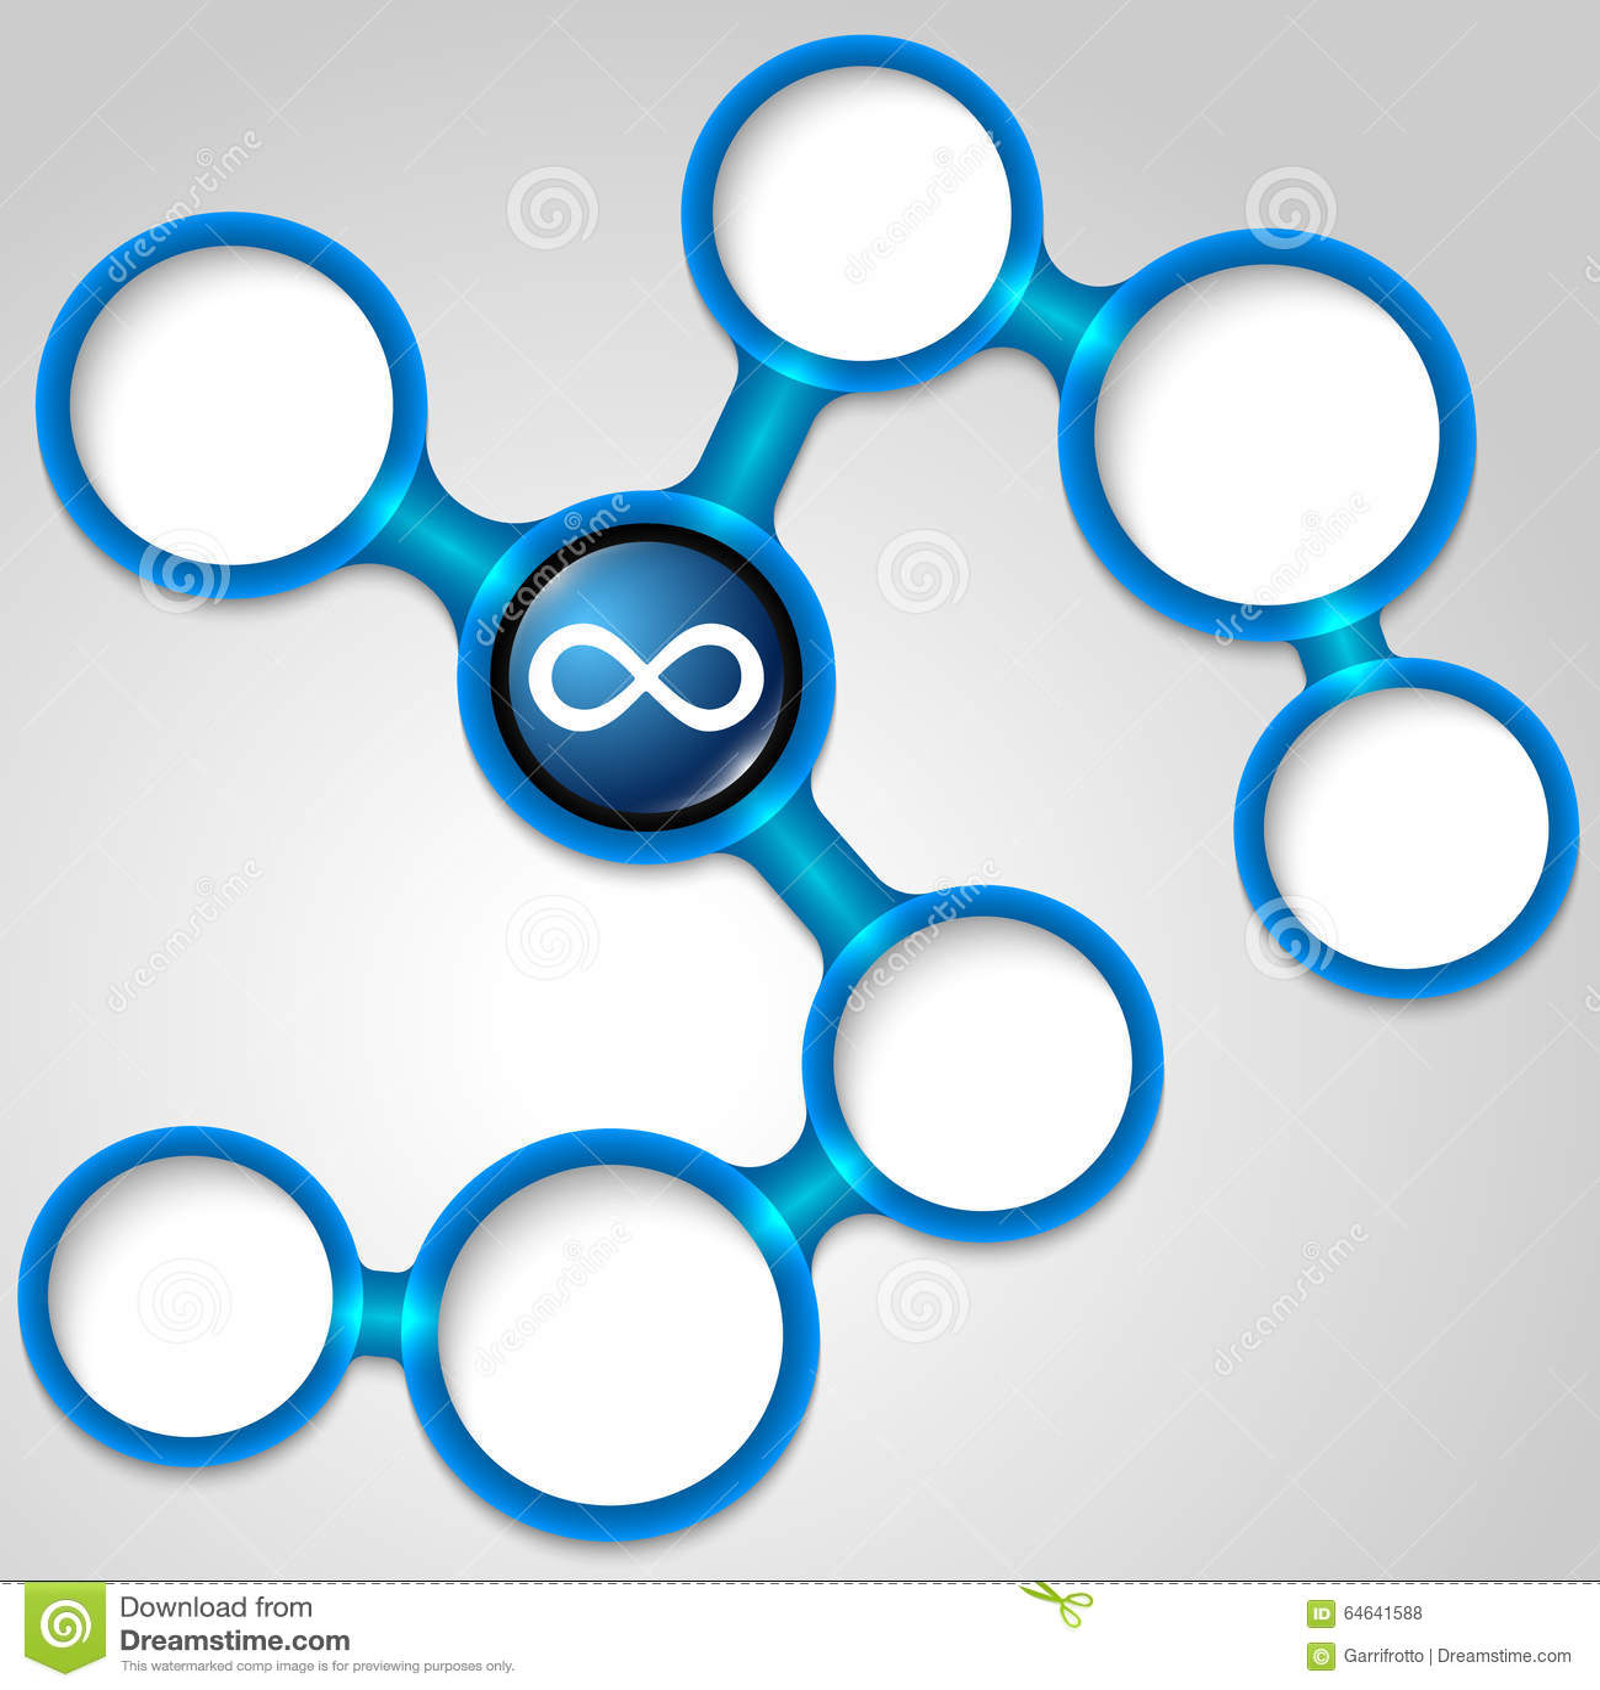 Infinity symbol stock vector. Illustration of frame, infinity - 64641588